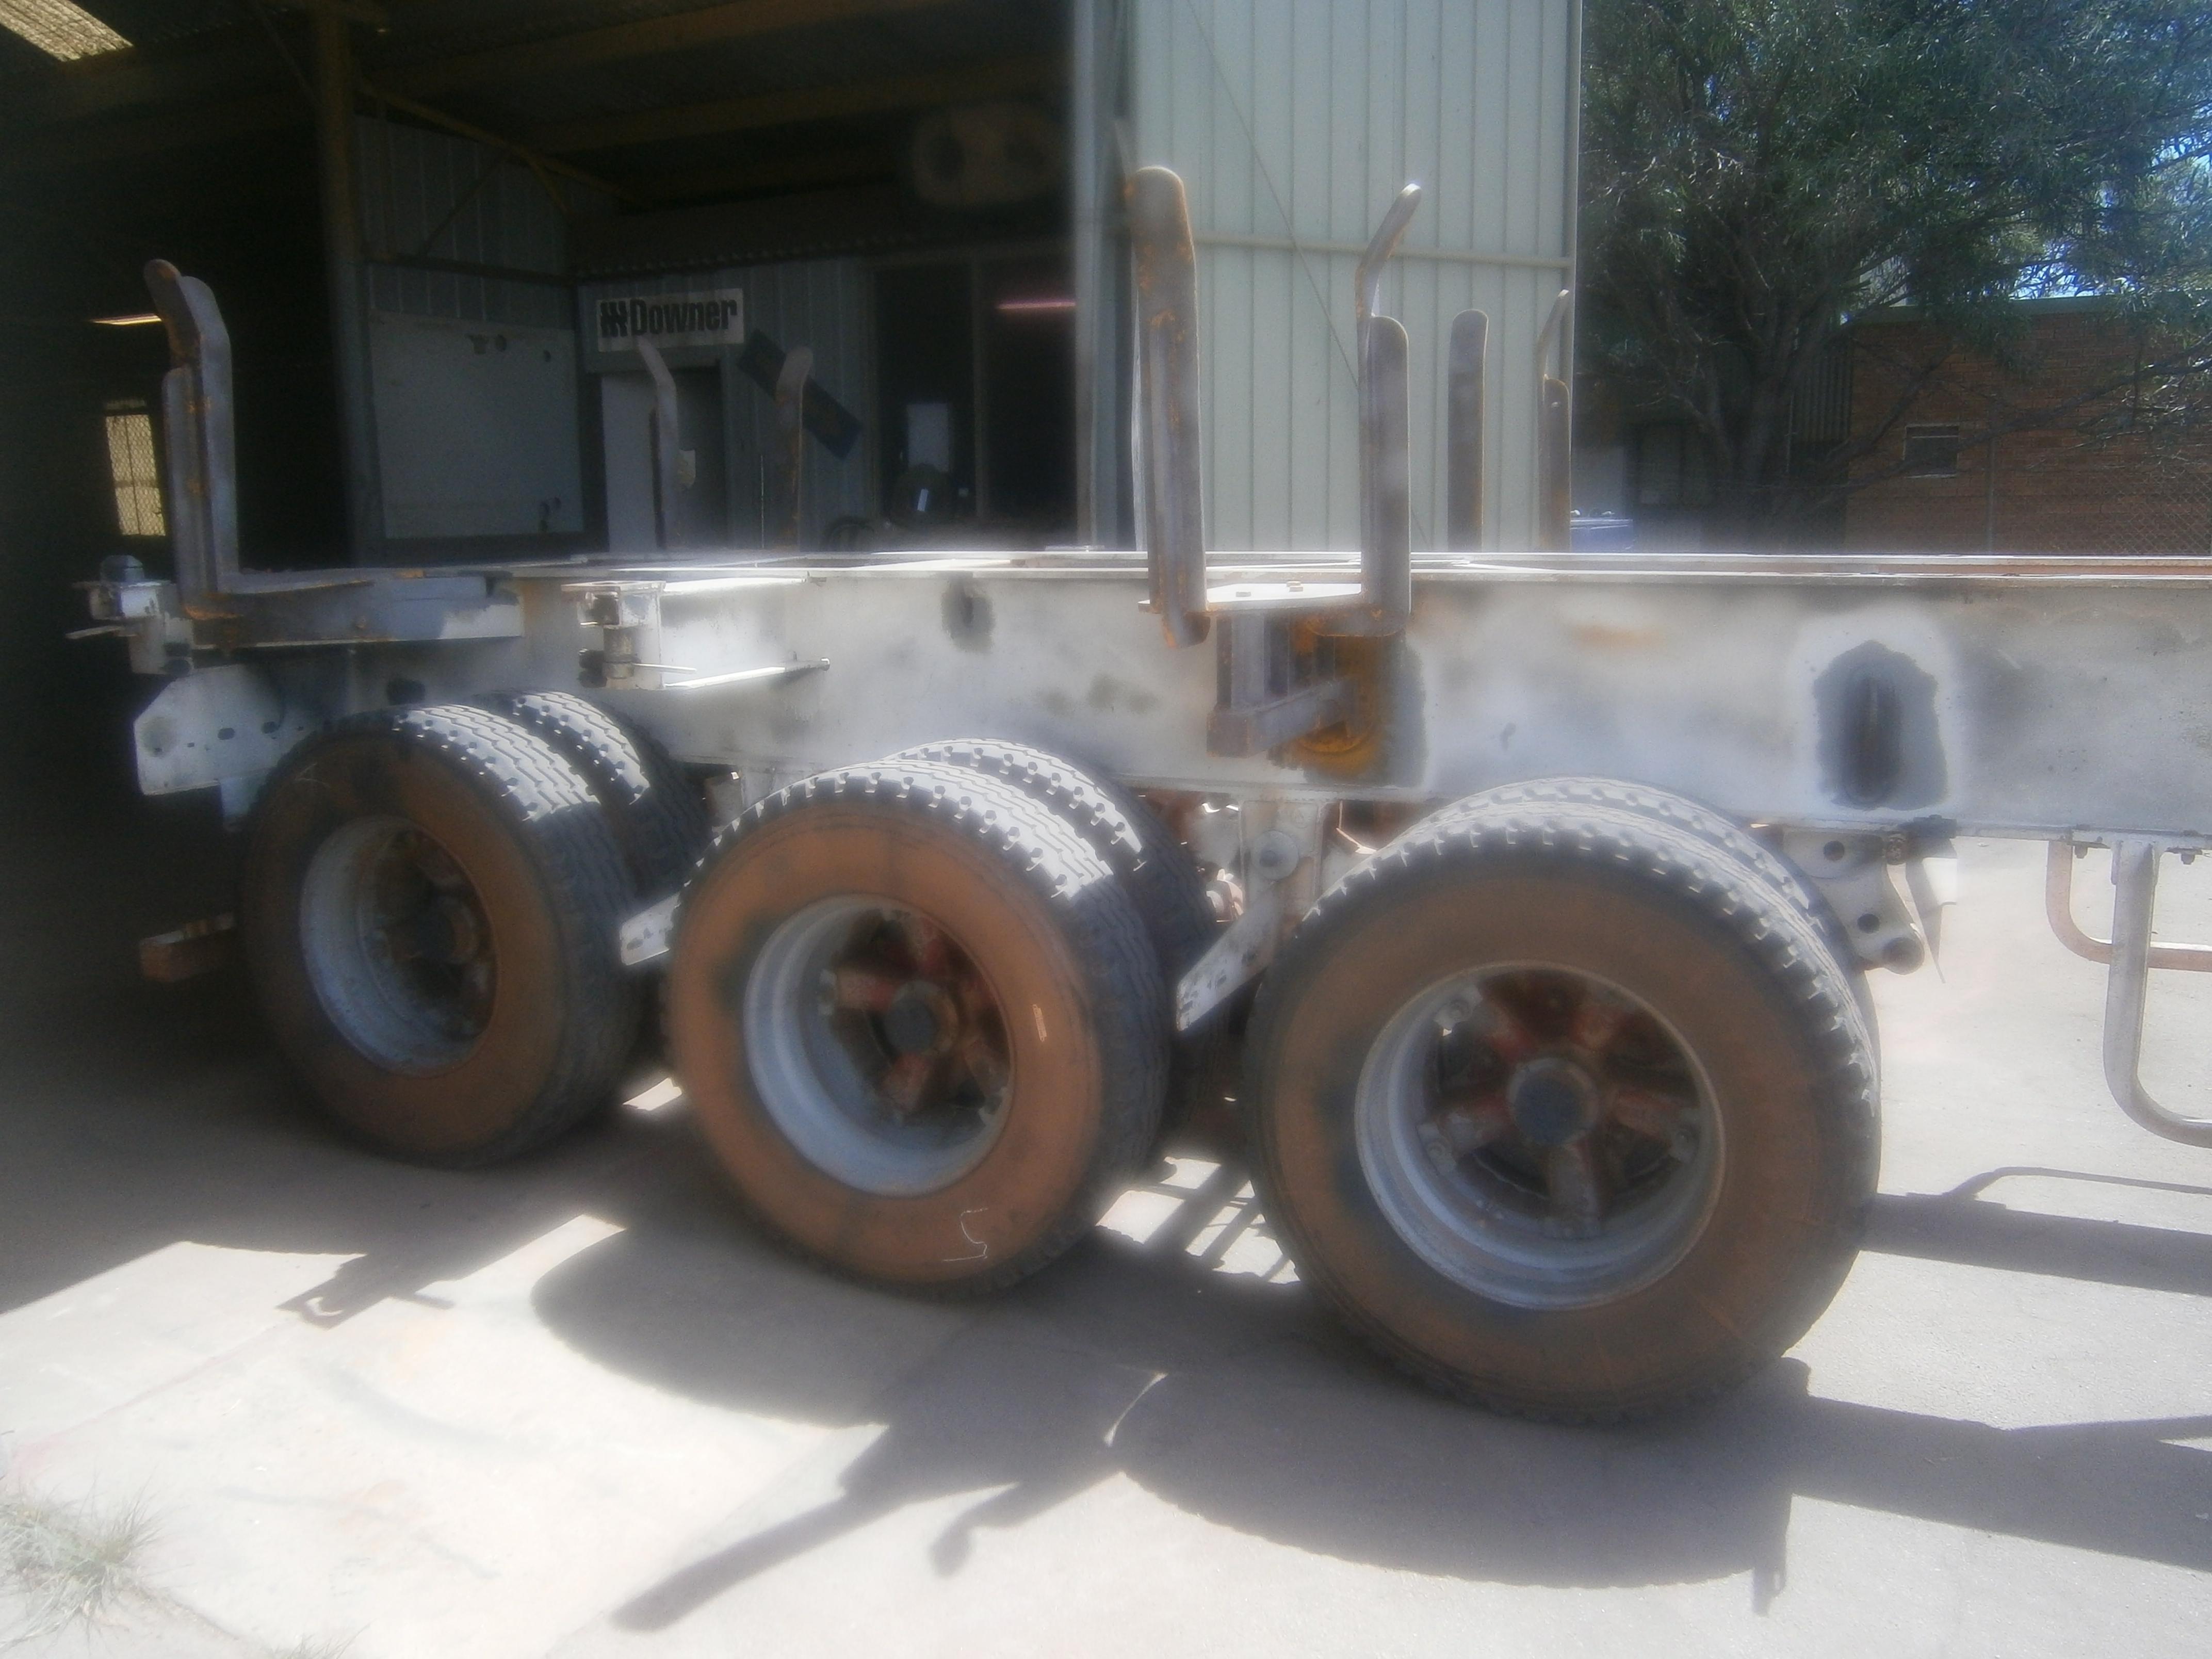 Flat deck trailer - before